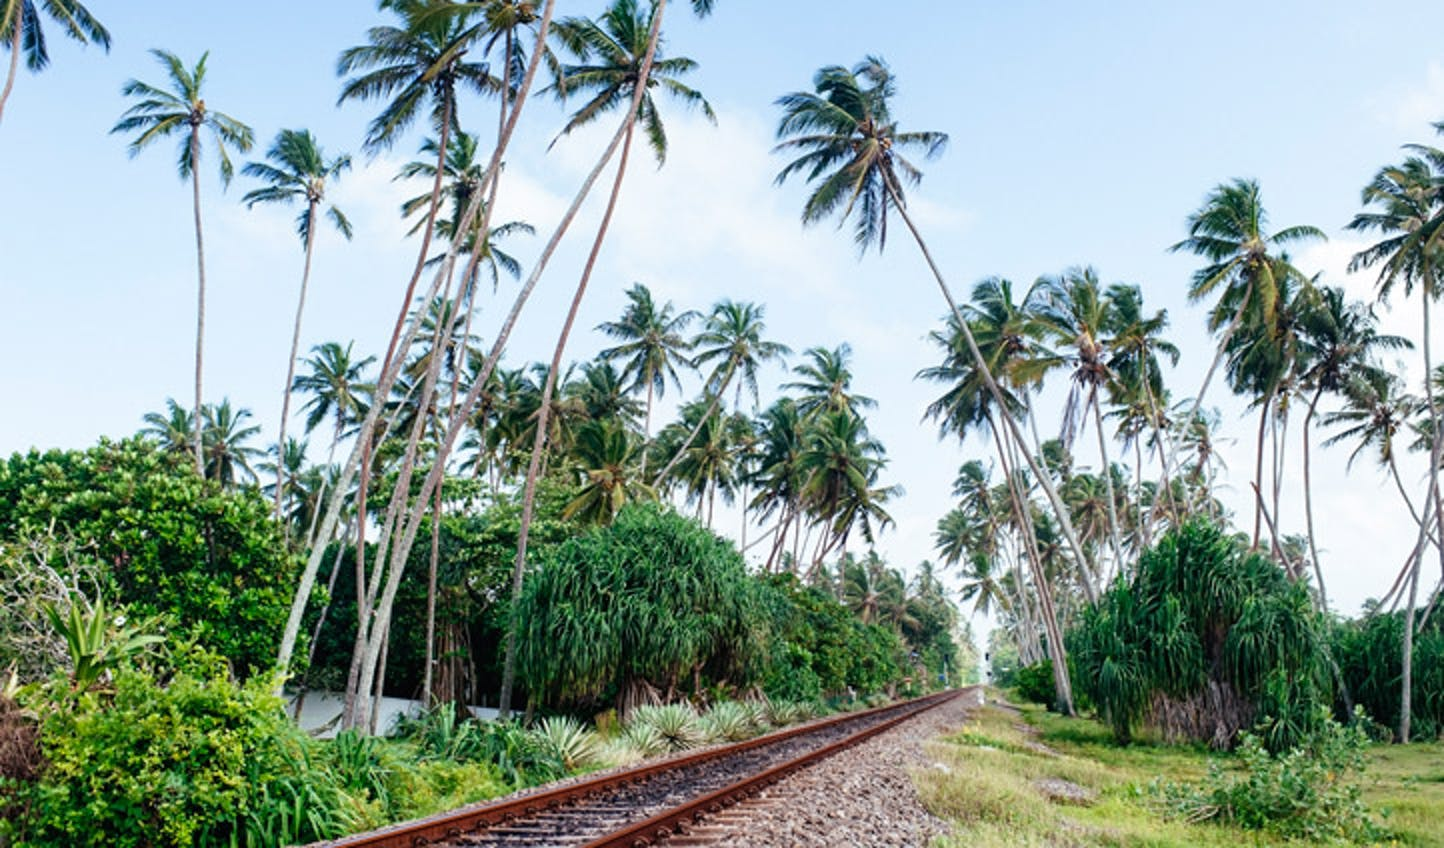 Journeying in Sri Lanka